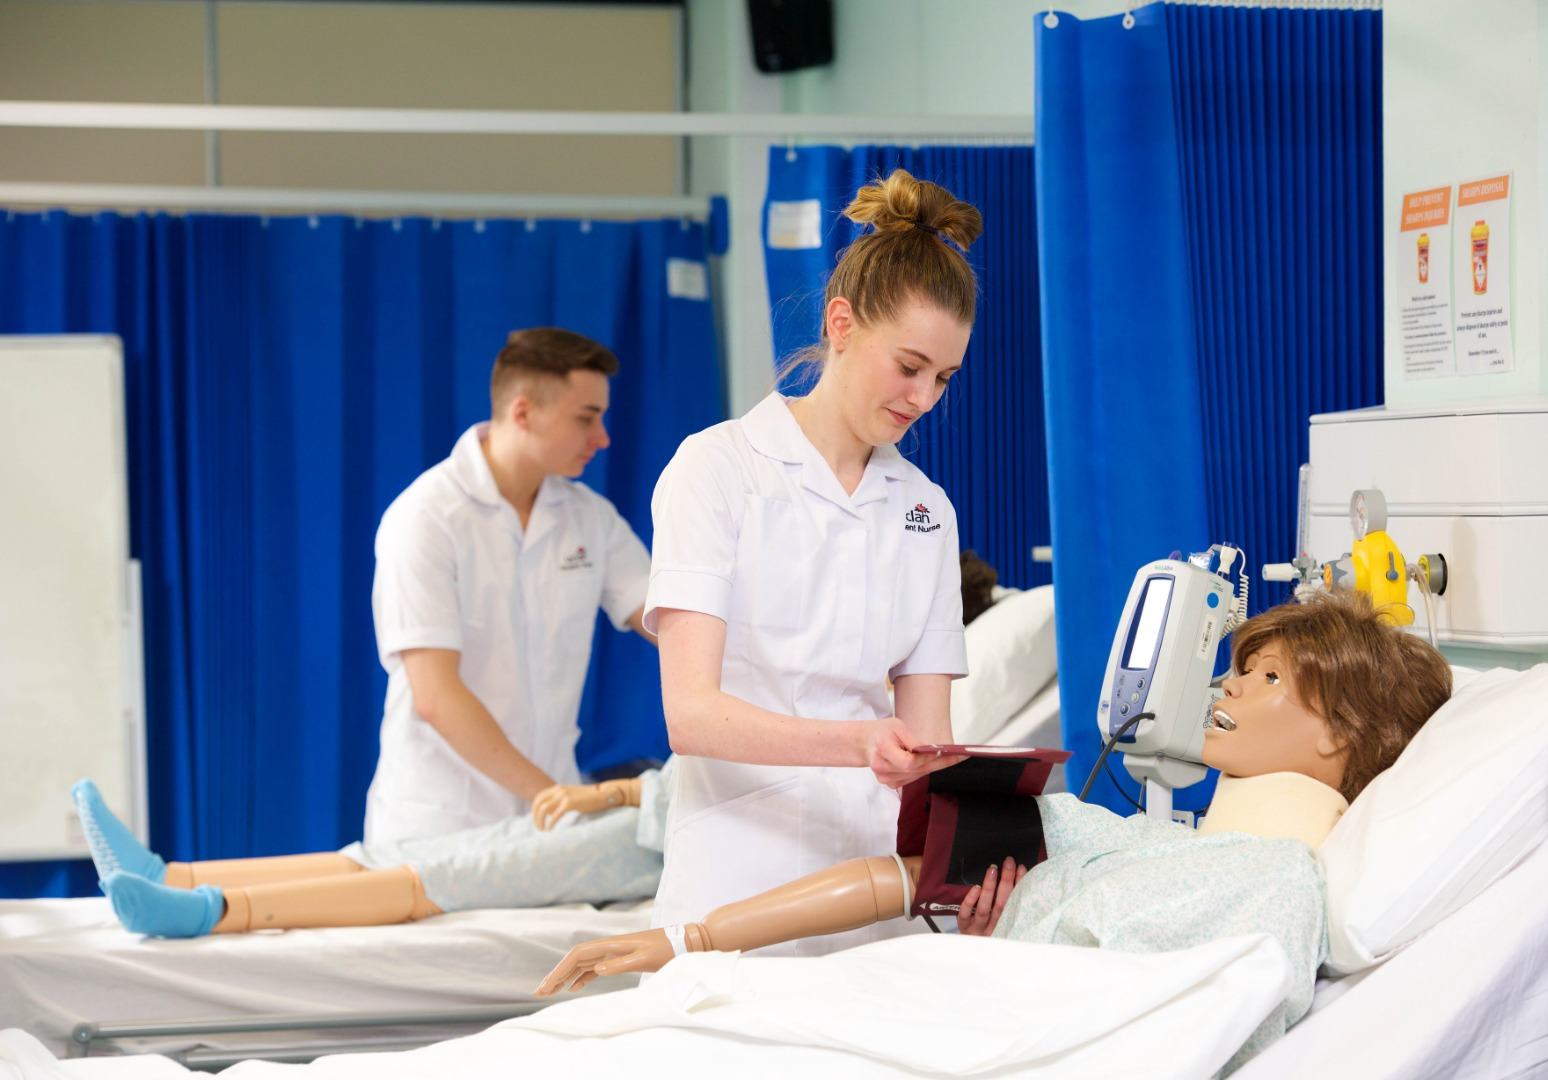 University-wide effort to help fight coronavirus